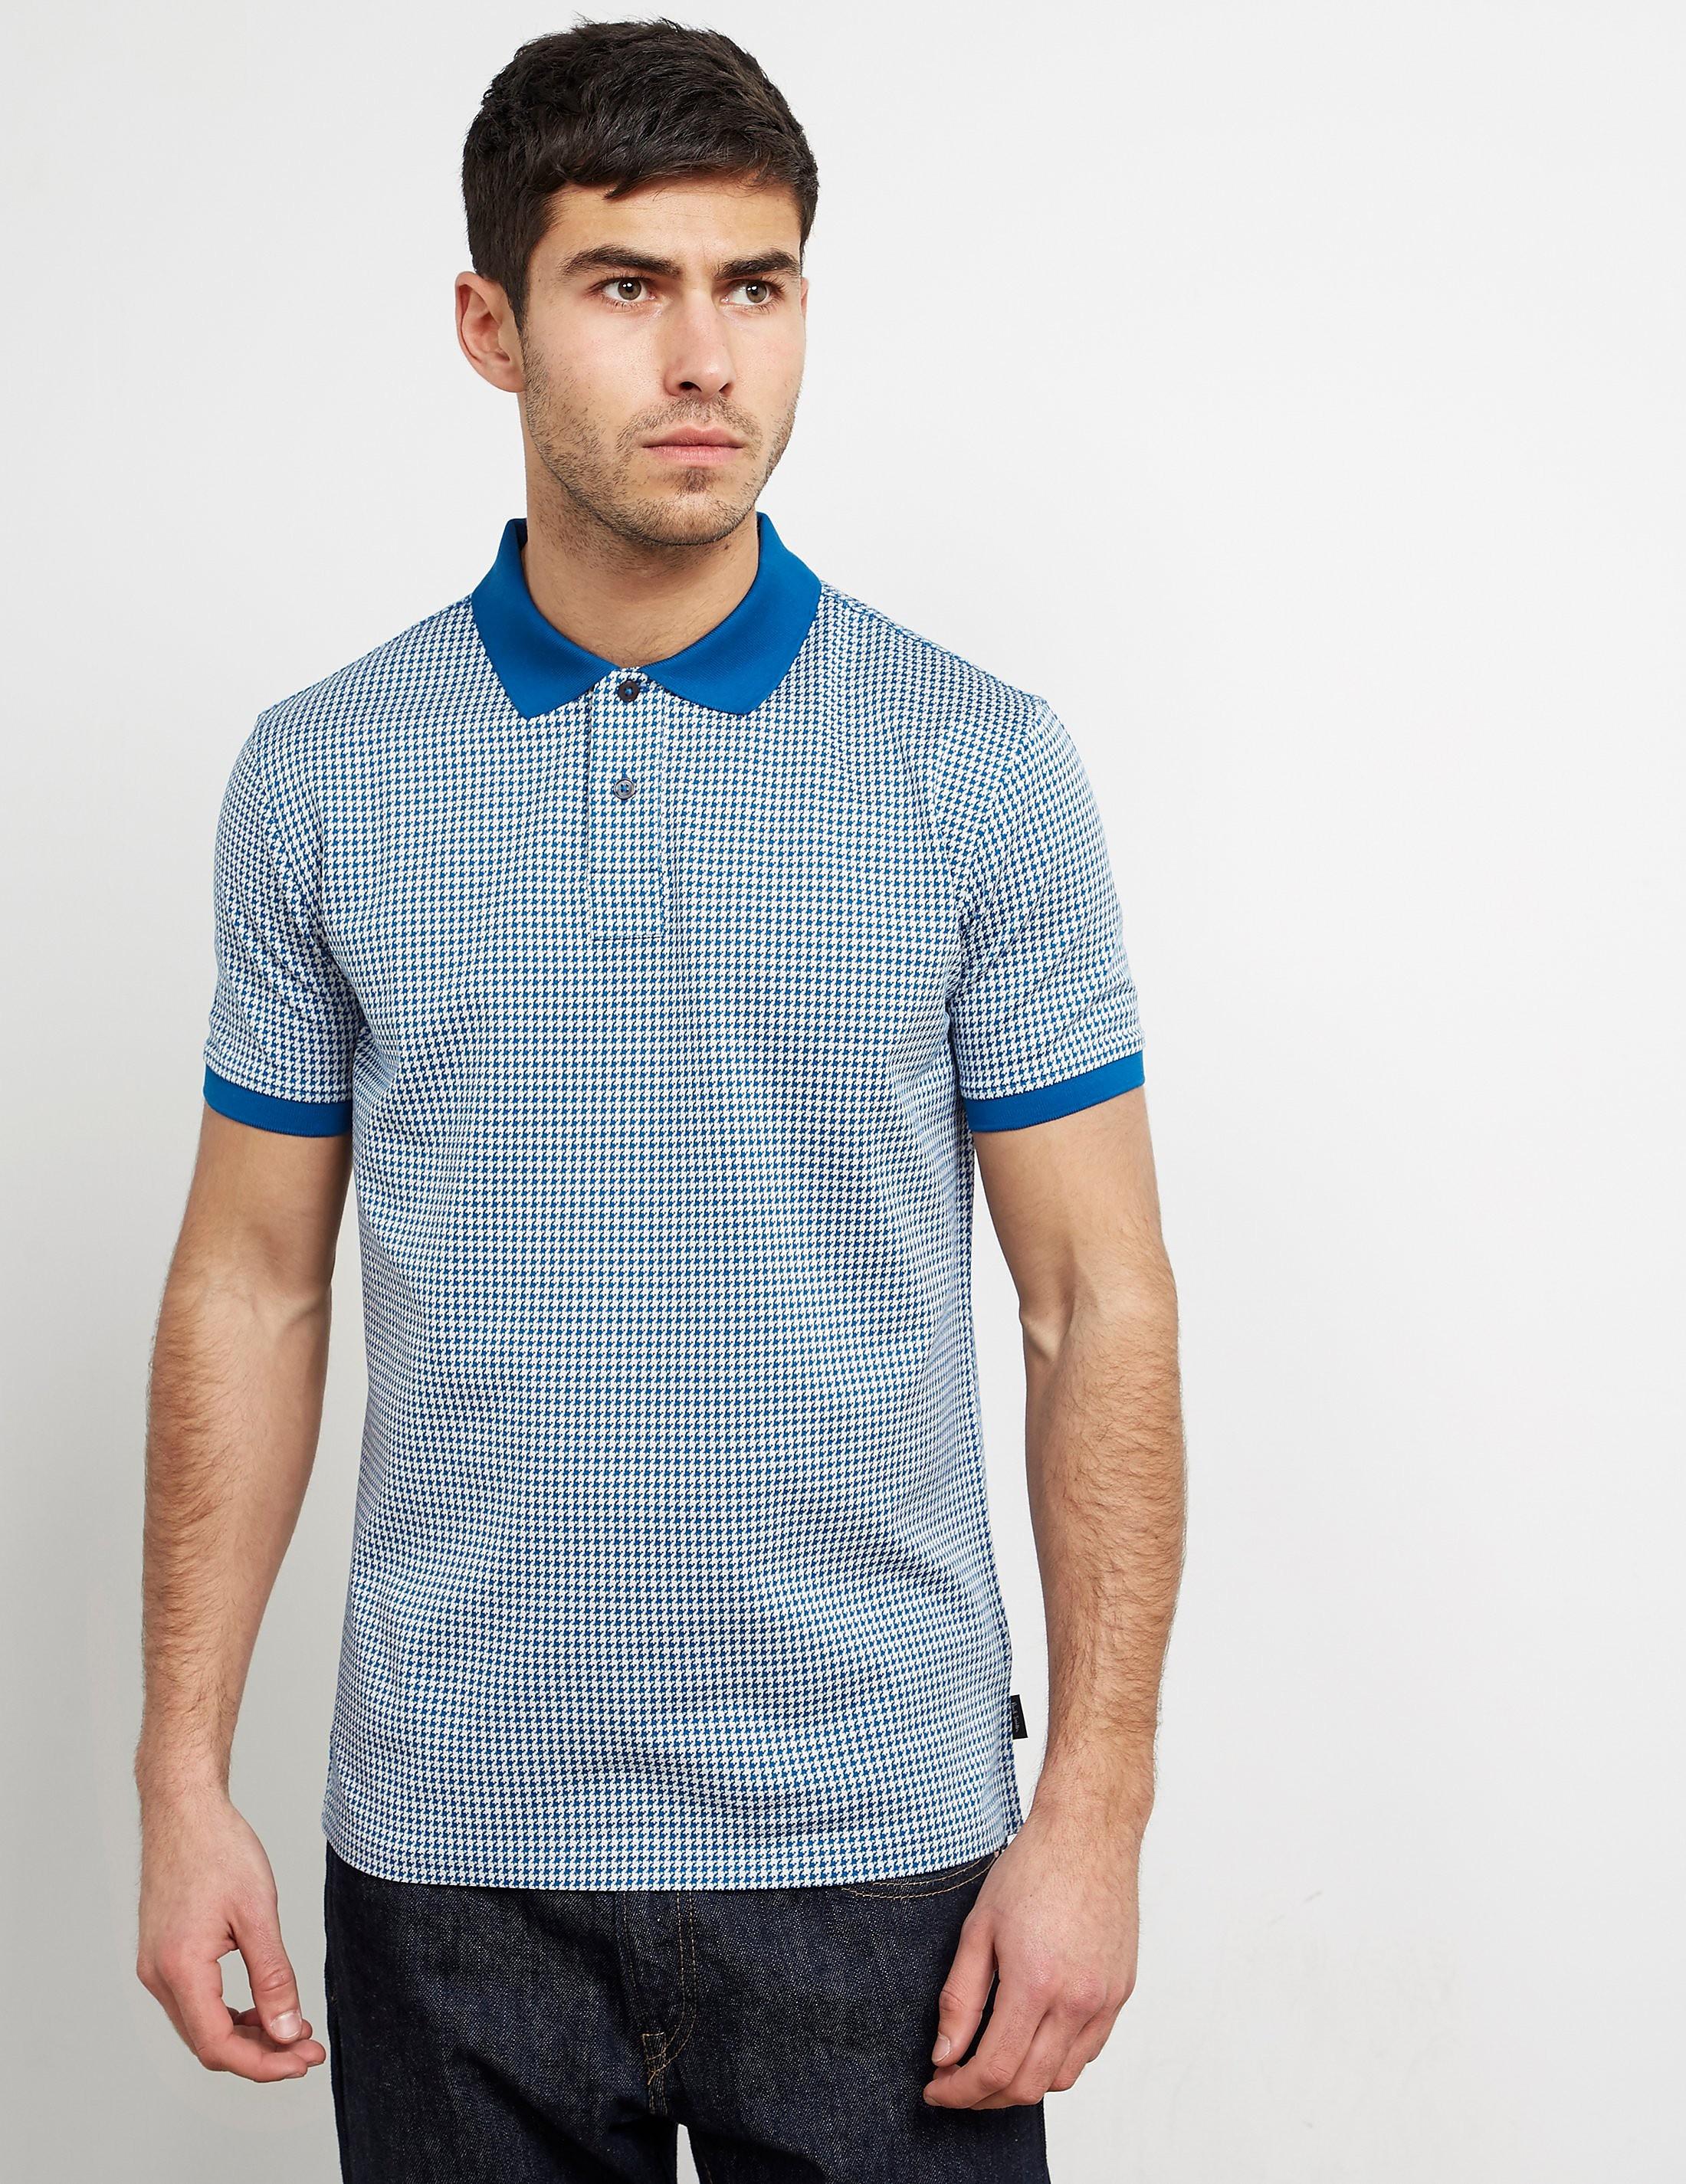 Paul Smith Hounds Jacquard Short Sleeve Polo Shirt